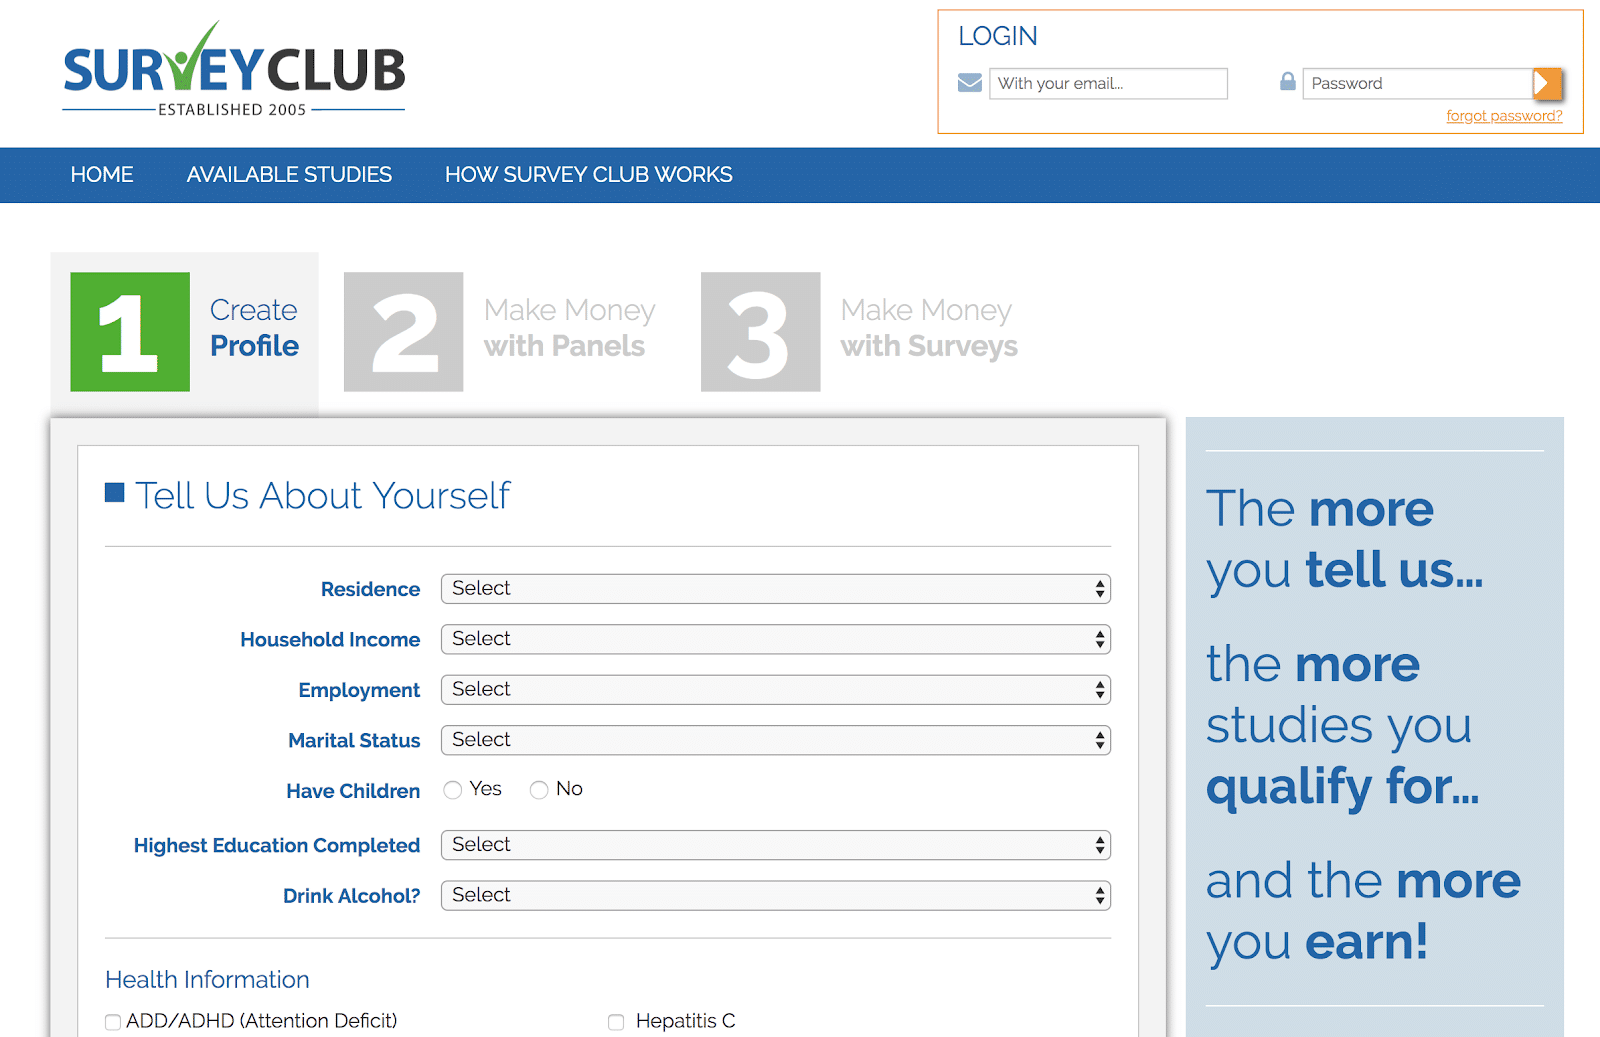 Create profile for SurveyClub